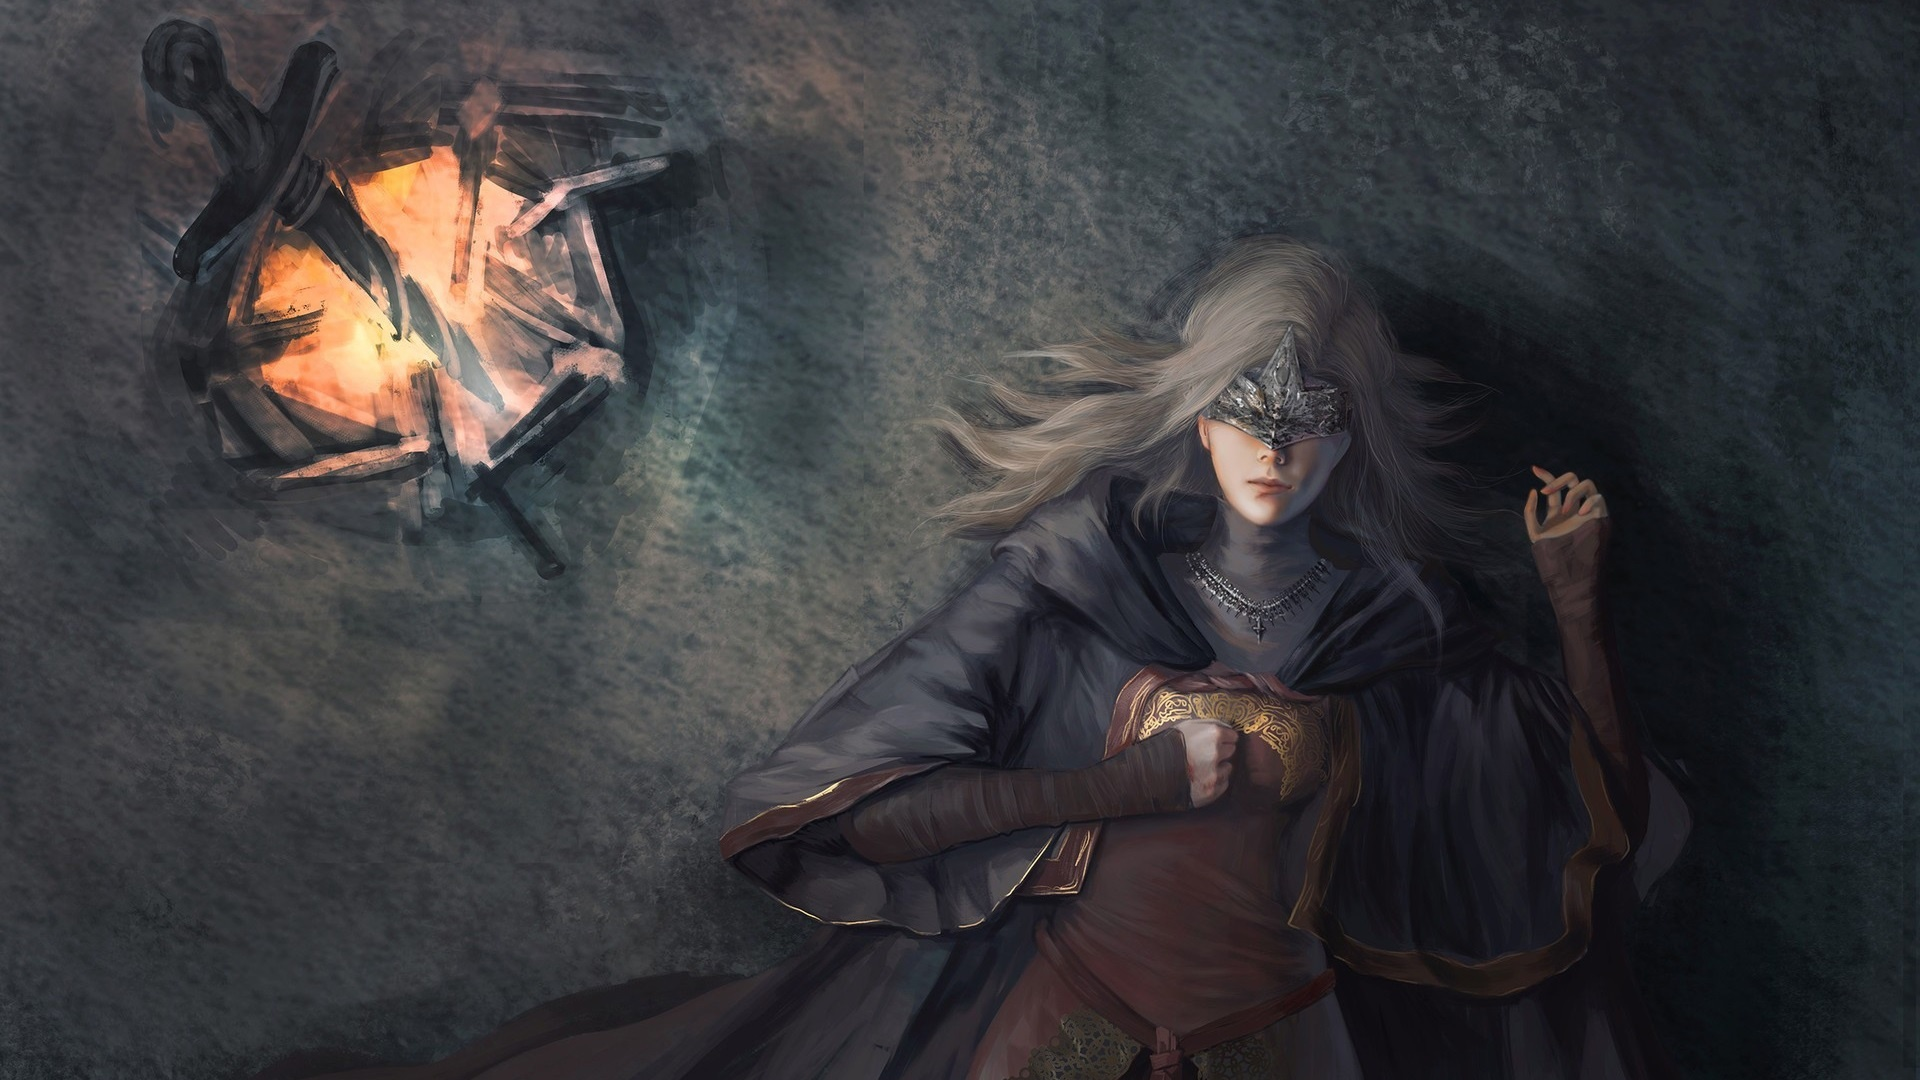 Dark Souls 3 hd background